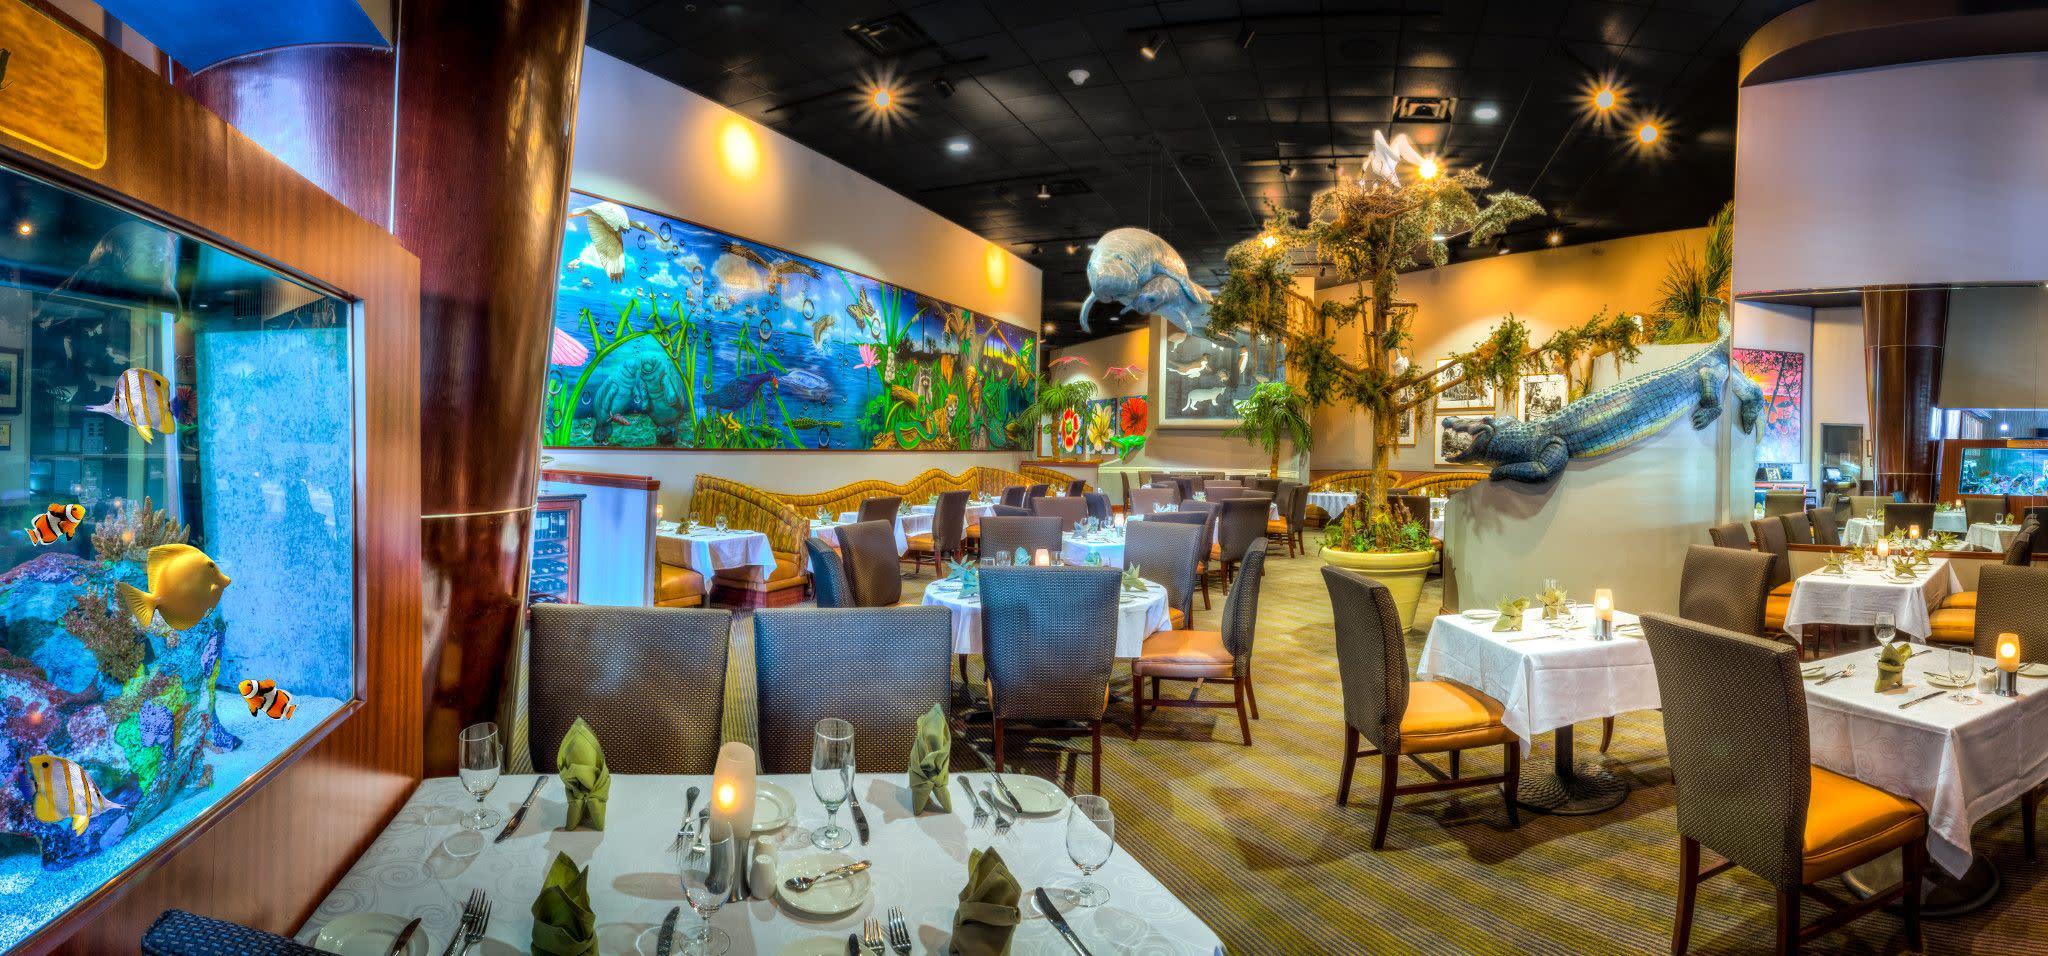 Everglades Restaurant at Rosen Centre Hotel in Orlando